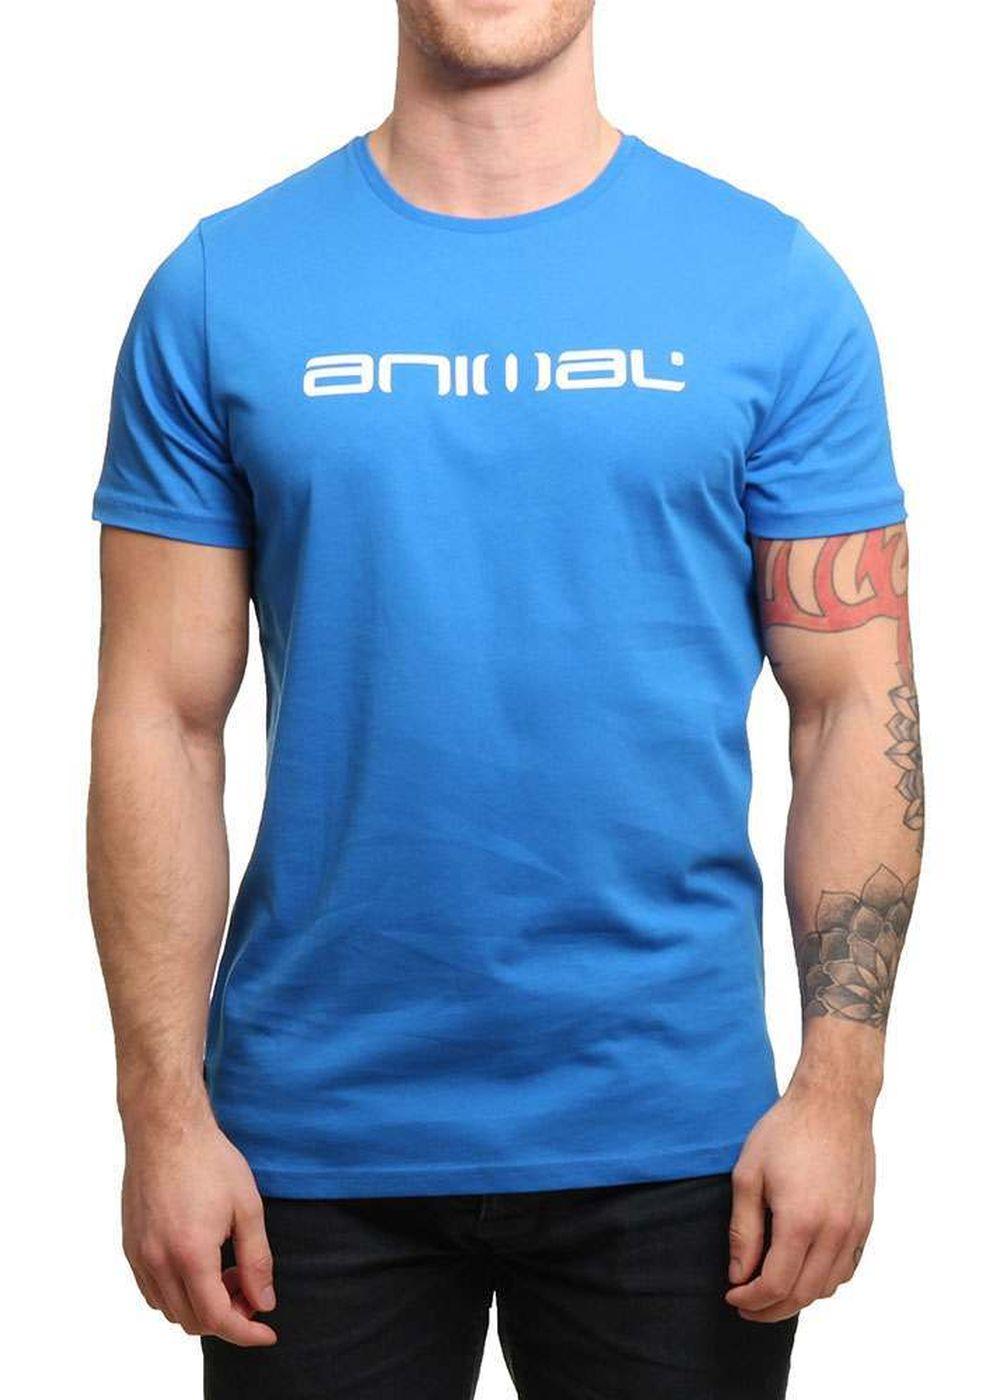 animal-classico-tee-victoria-blue